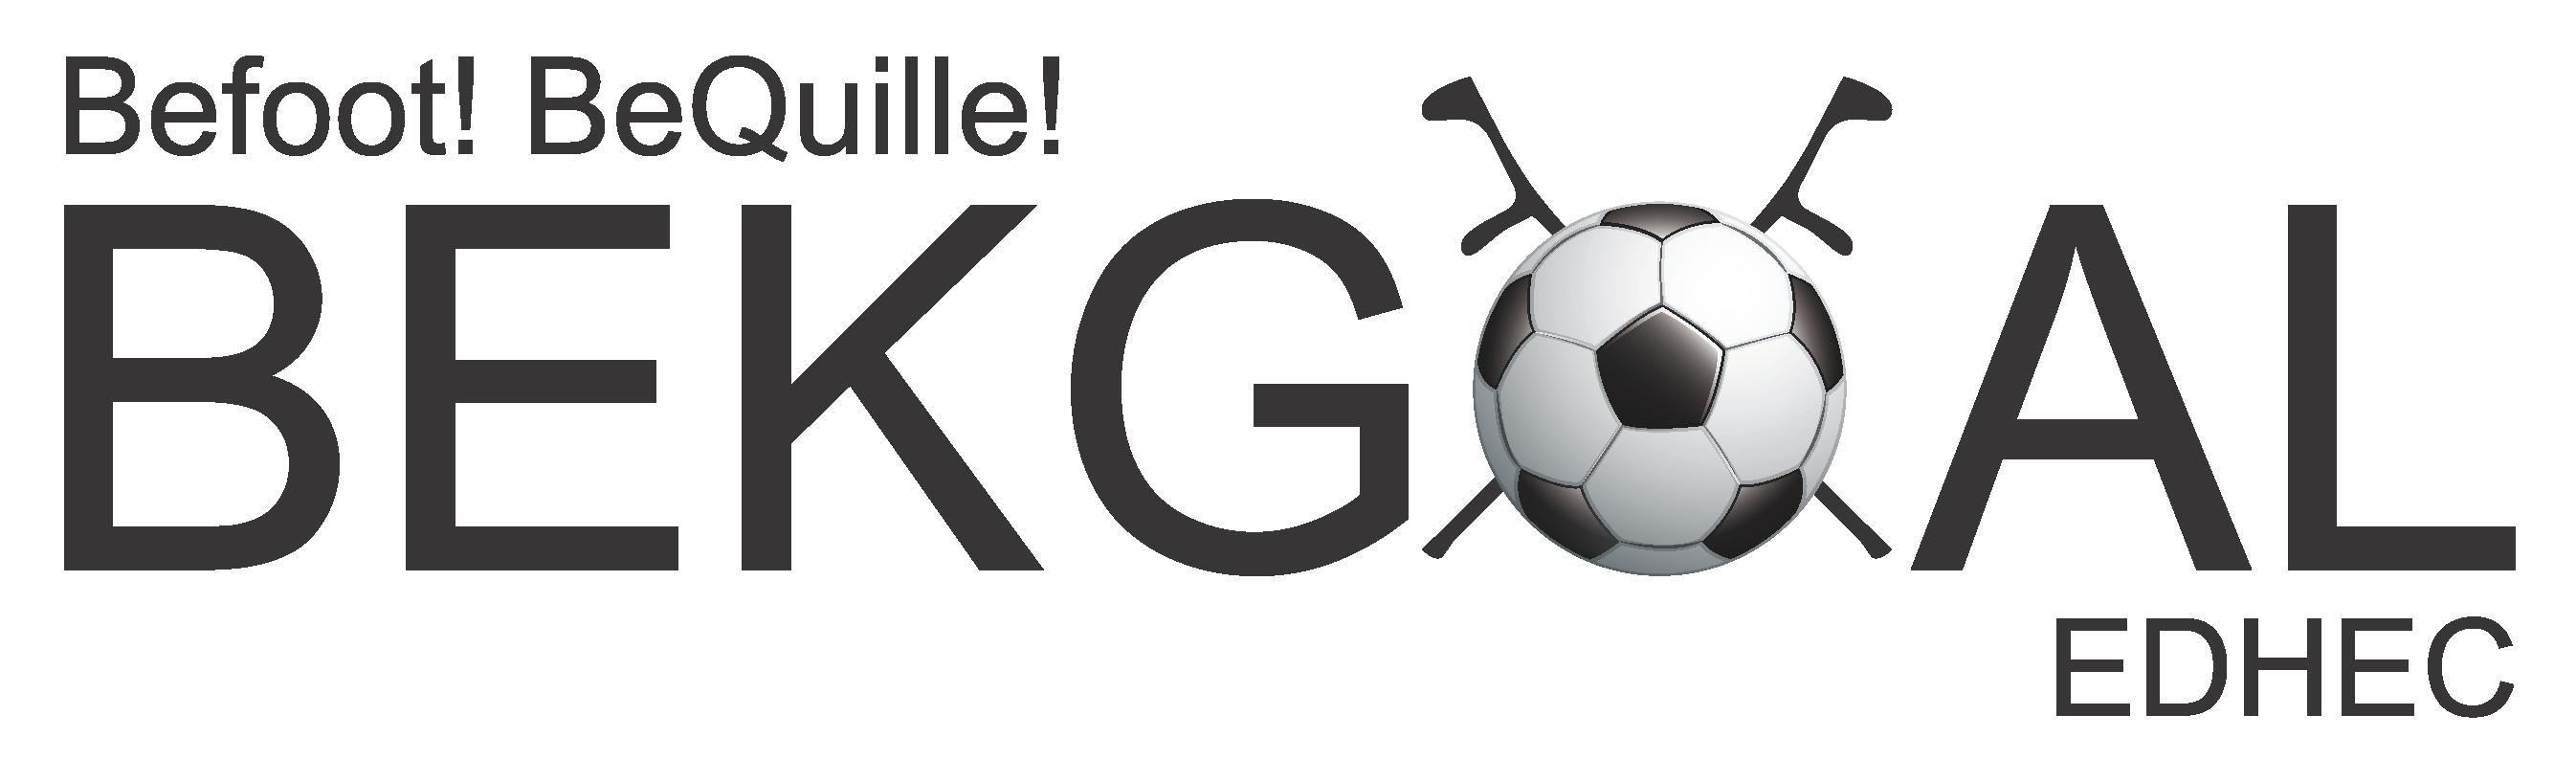 logo net bekgoal